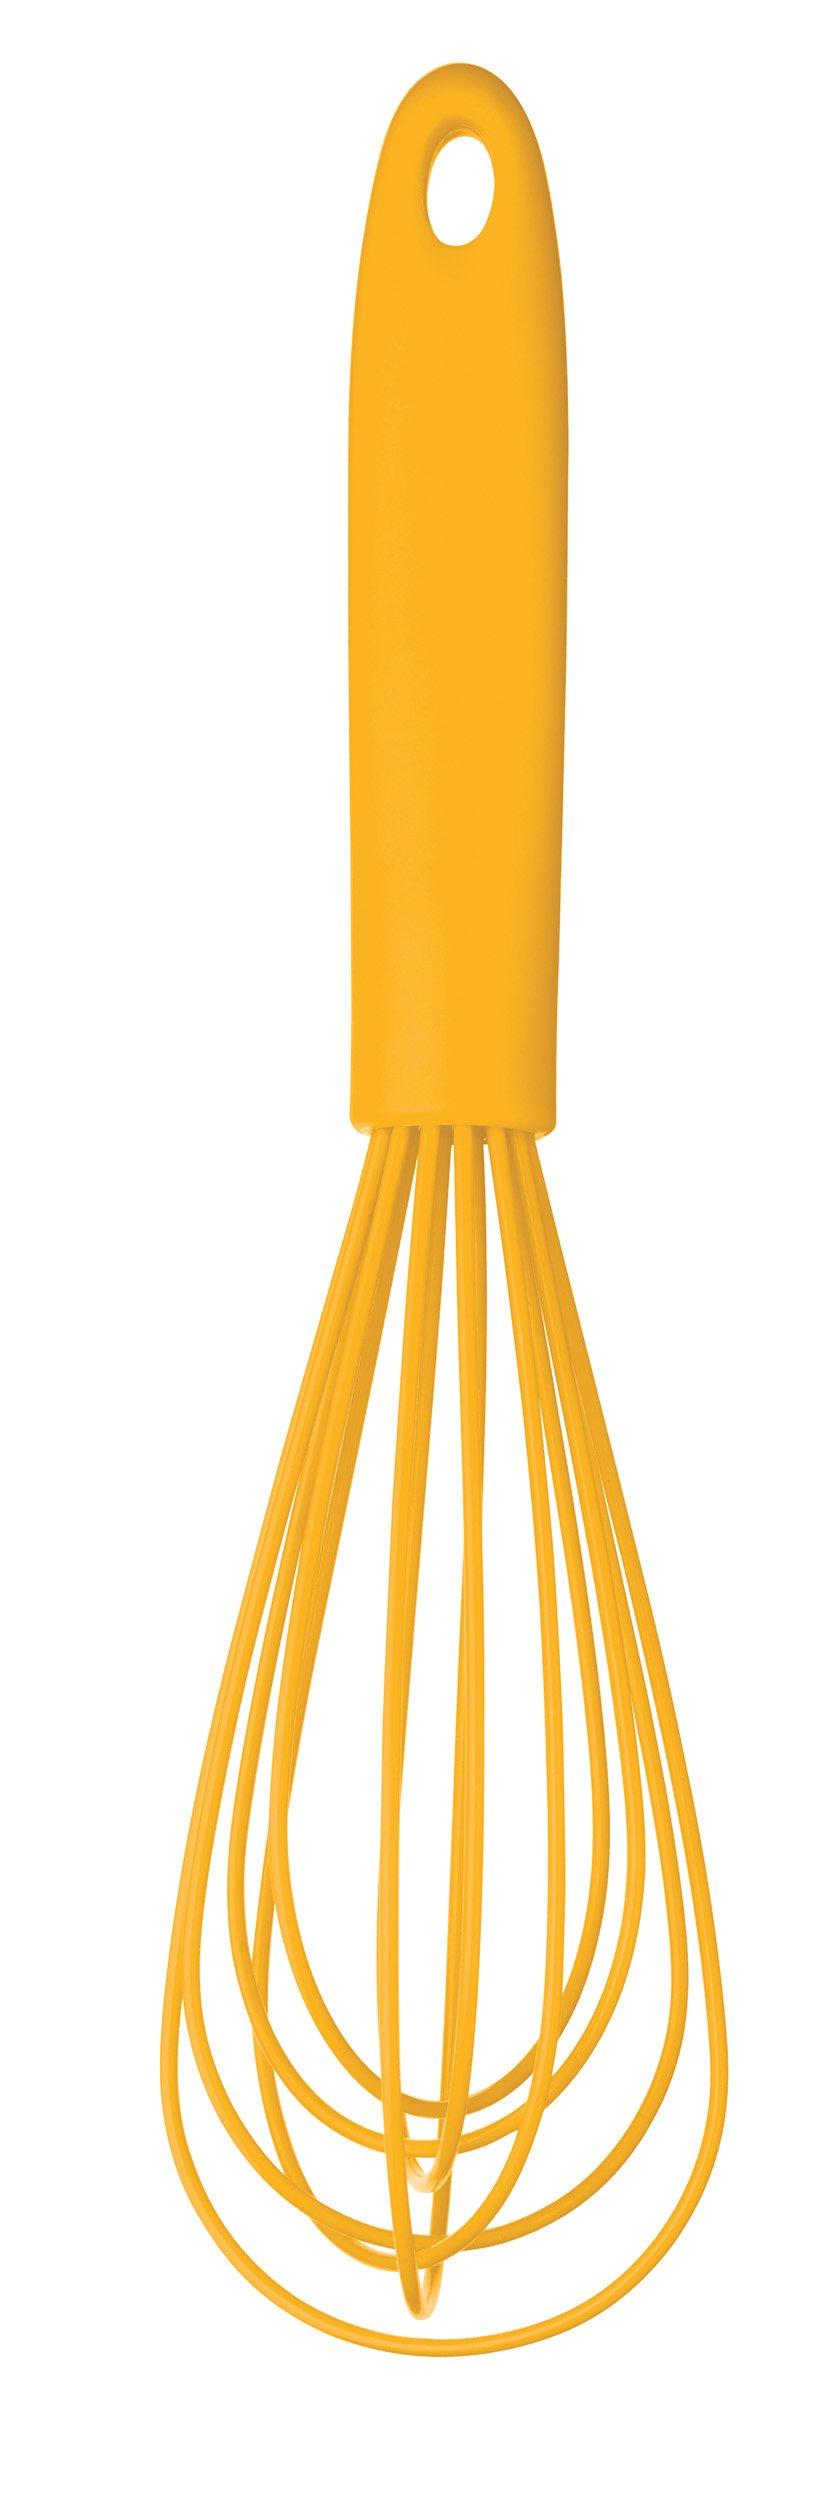 Frusta cucina silicone Colourworks Gialla